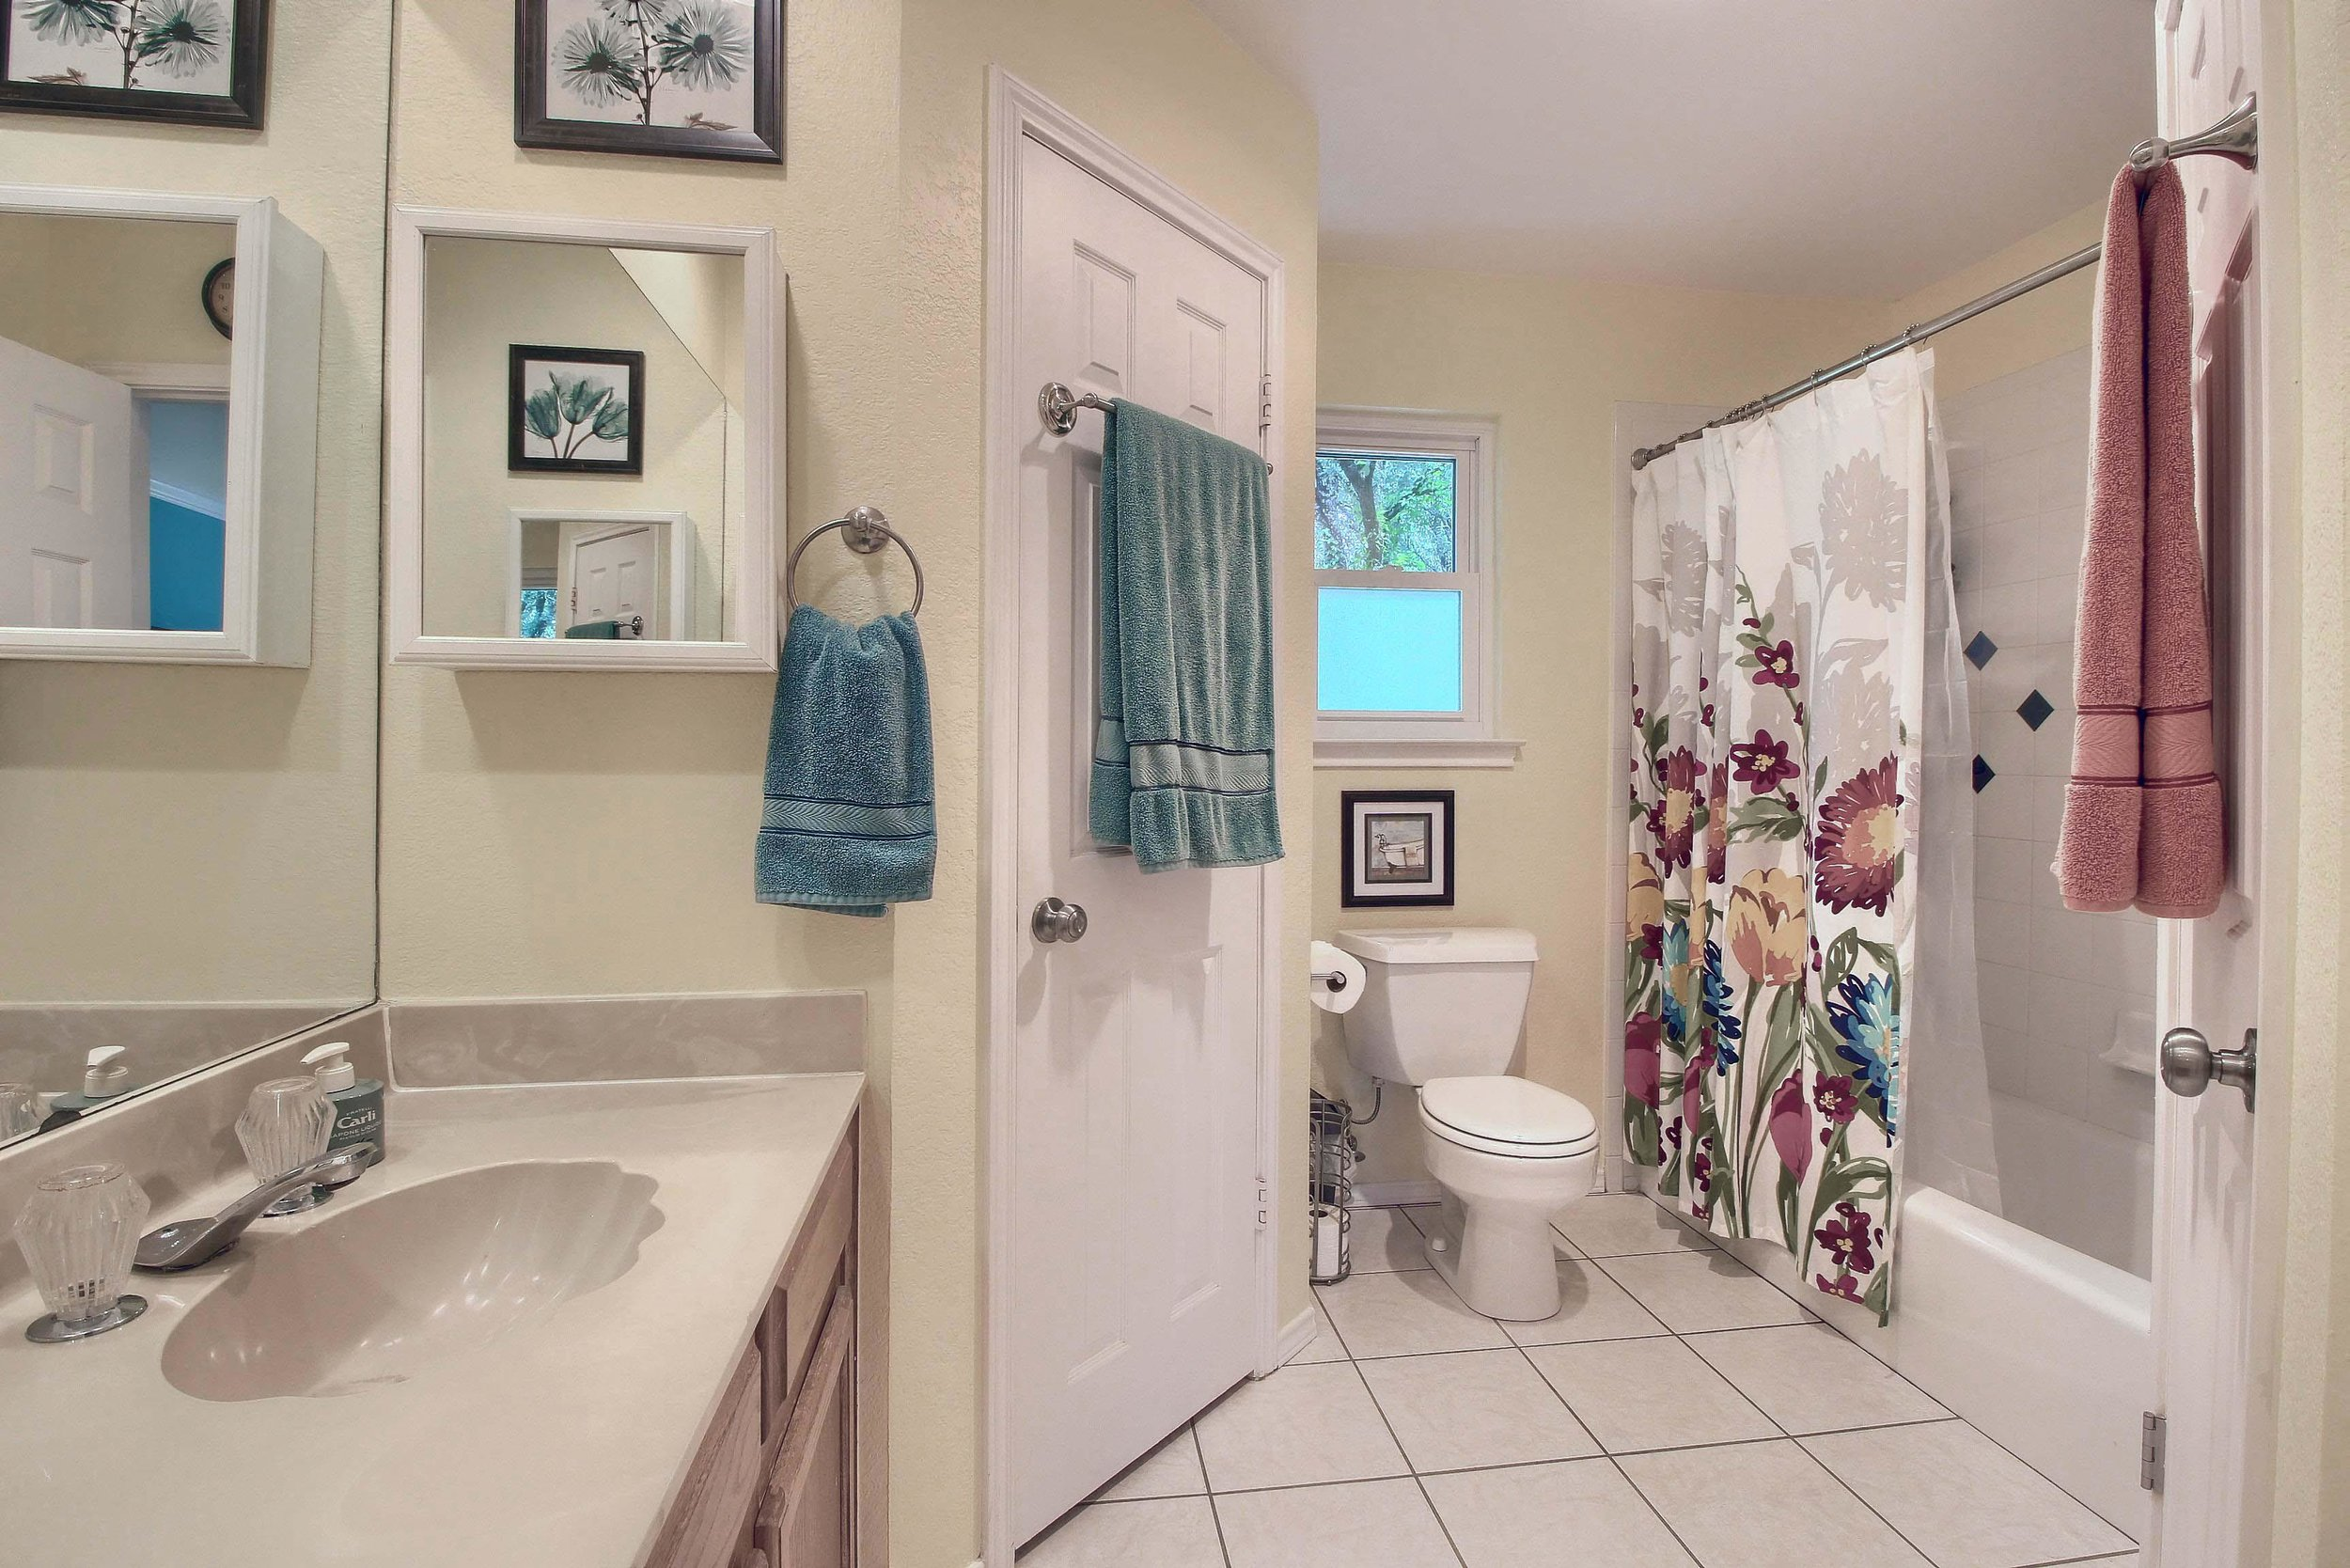 05_Master_Bathroom_IMG_8126.JPG